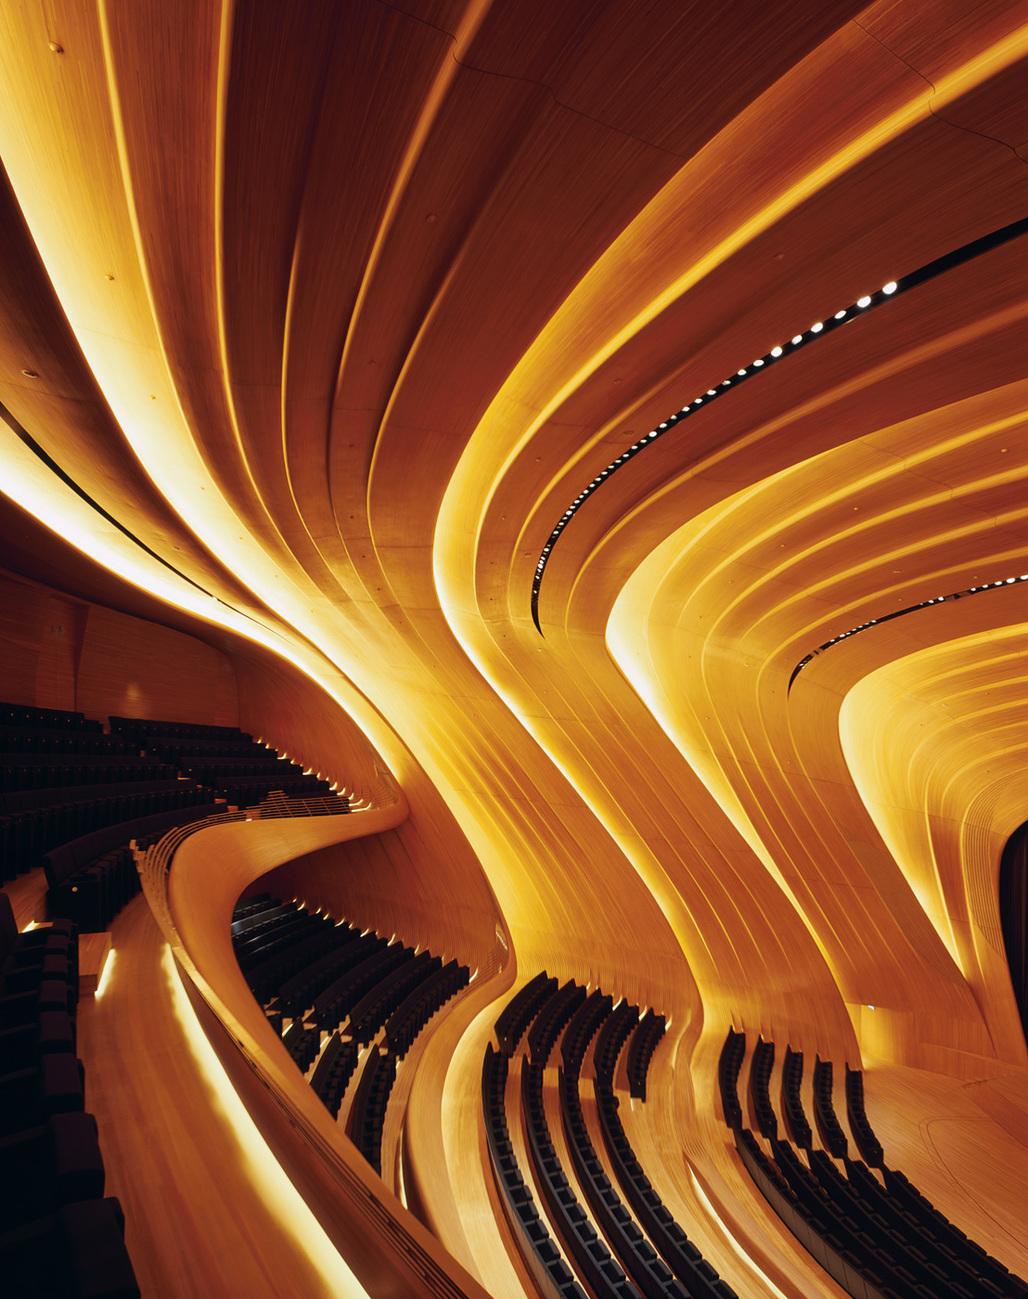 Shortlisted in Culture: Heydar Aliyev Center by Zaha Hadid Architects (UK); Photo: Helene Binet